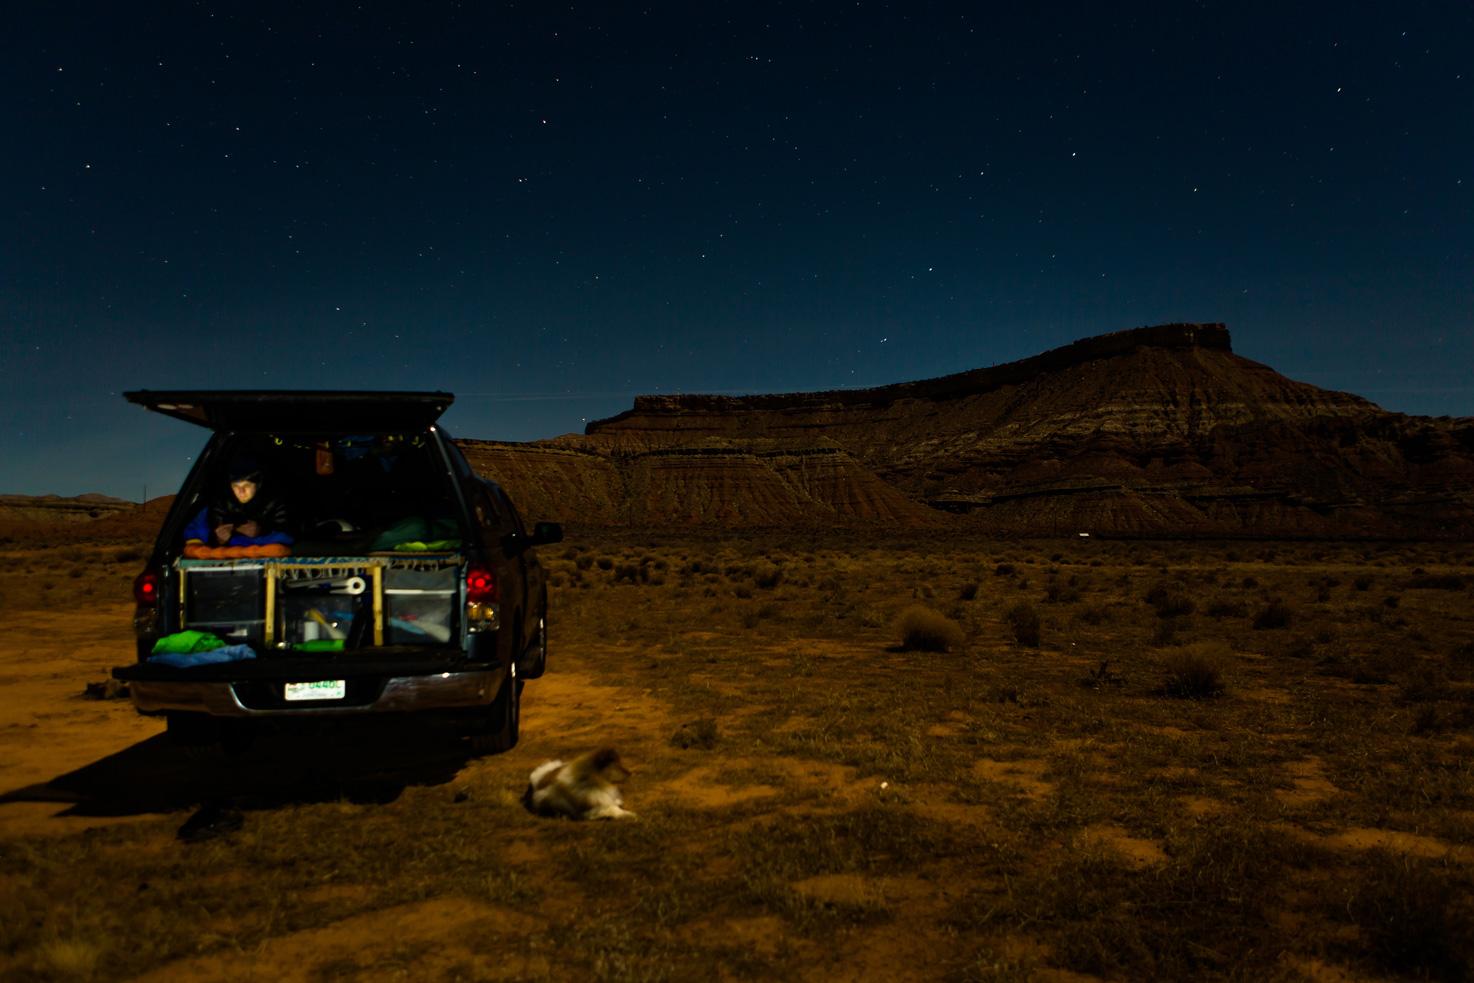 CindyGiovagnoli_Utah_Zion_desert_night_morning_coffee_blm_land_off_grid-003.jpg